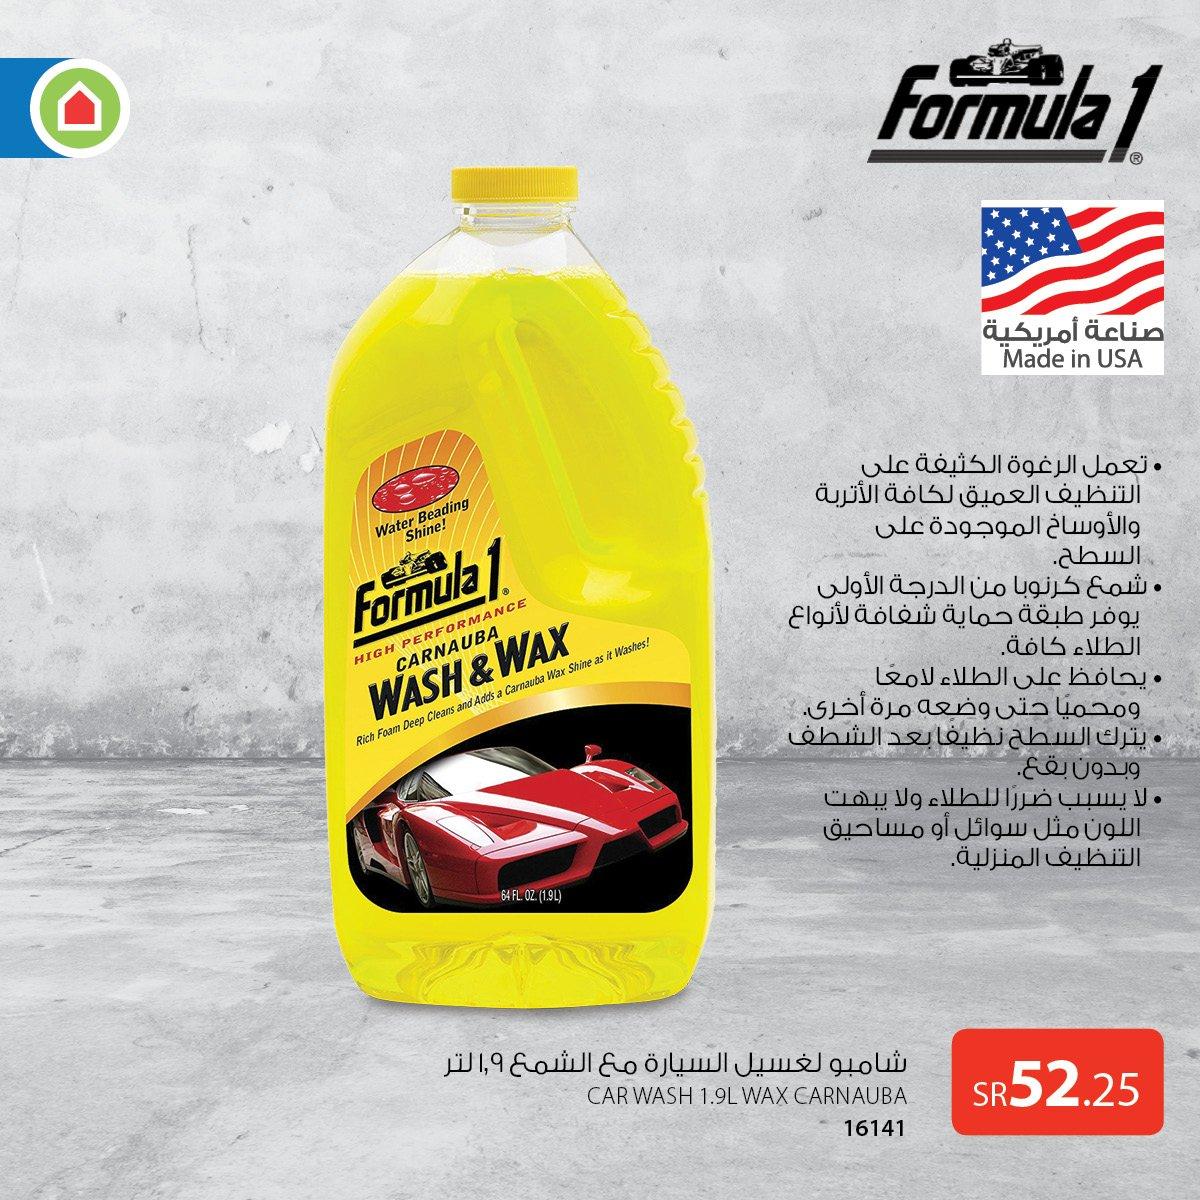 Saco ساكو Pa Twitter اضمن نظافة سيارتك مع شامبو غسيل السيارات مع الشمع ١ ٩ لتر متوفر الآن لدى ساكو الكل للكل